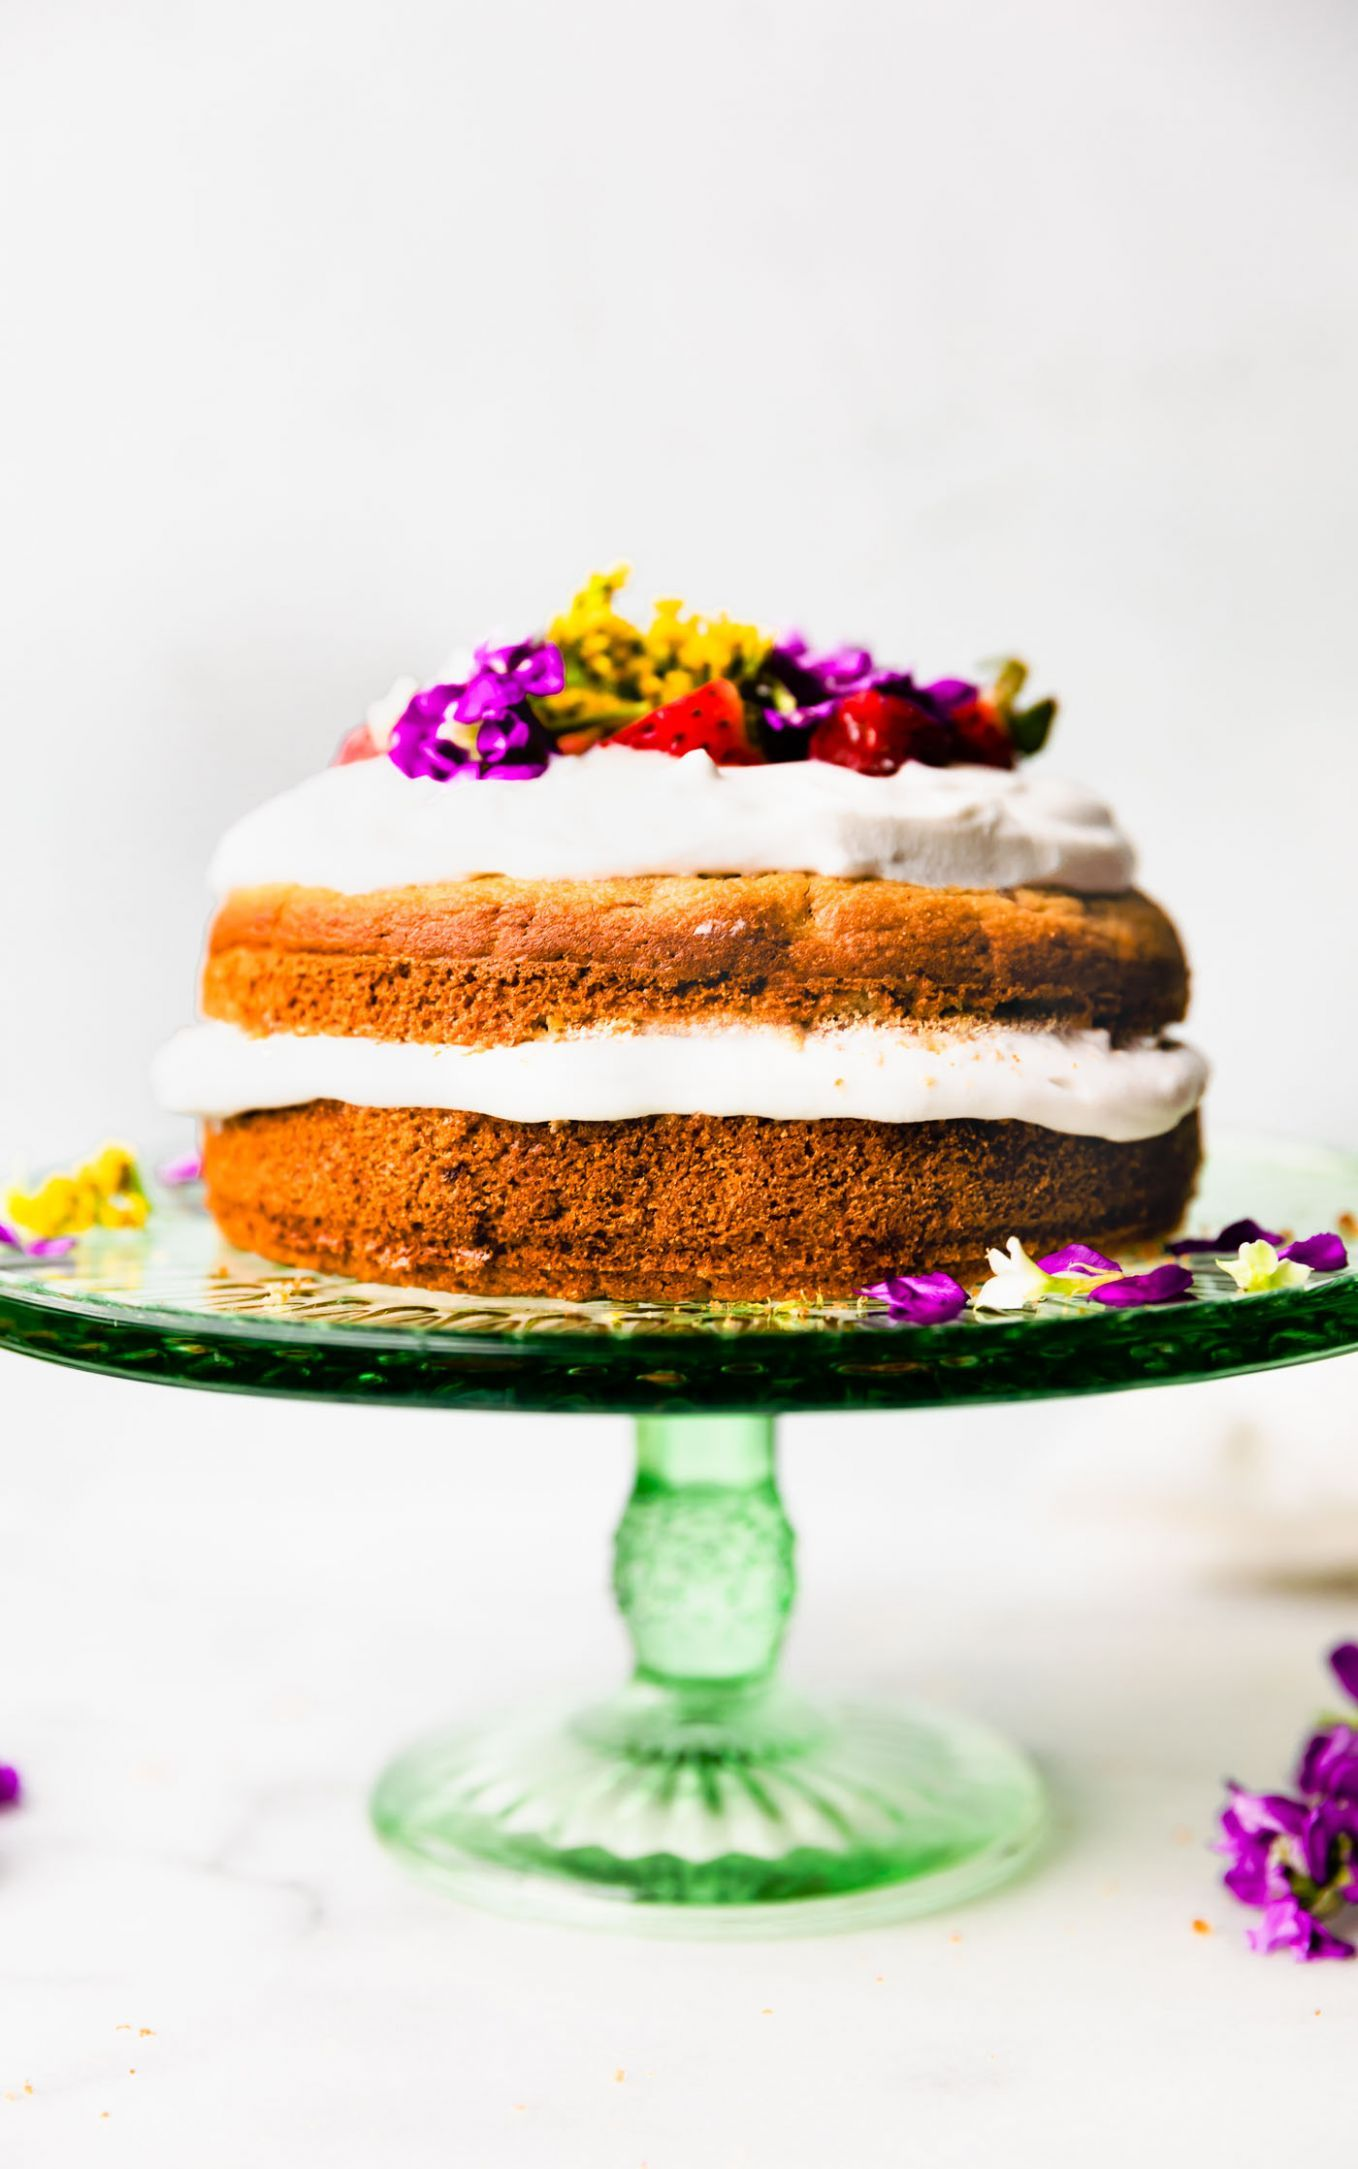 Recipes Cakes For Dogs cakesfordogsrecipesuk